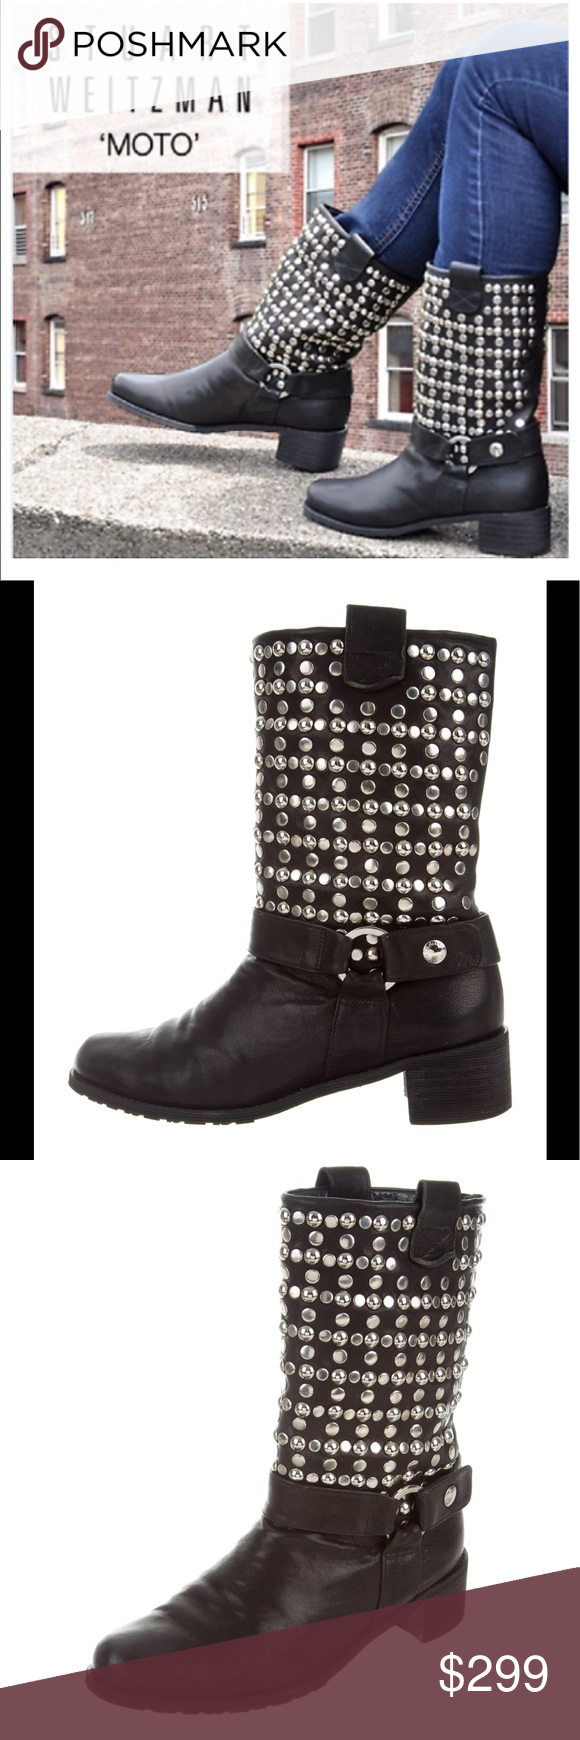 c6d47d2c7c Stuart Weitzman studded black Moto boots 8 Excellent condition Bought it on  Teal Teal but little